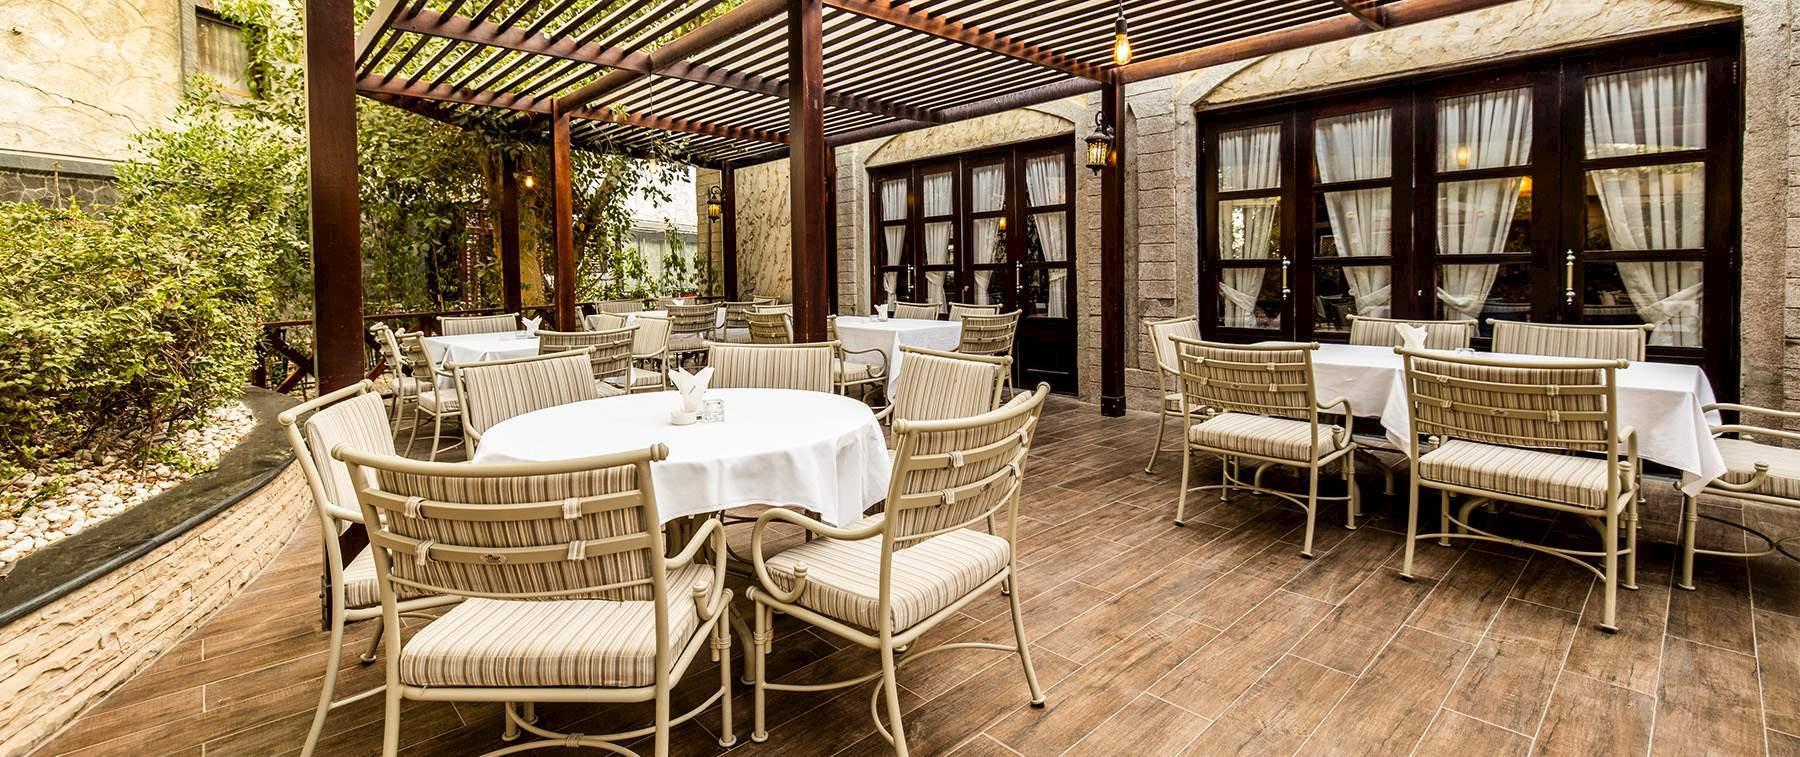 Casa Mia: The best italian restaurant in Dubai